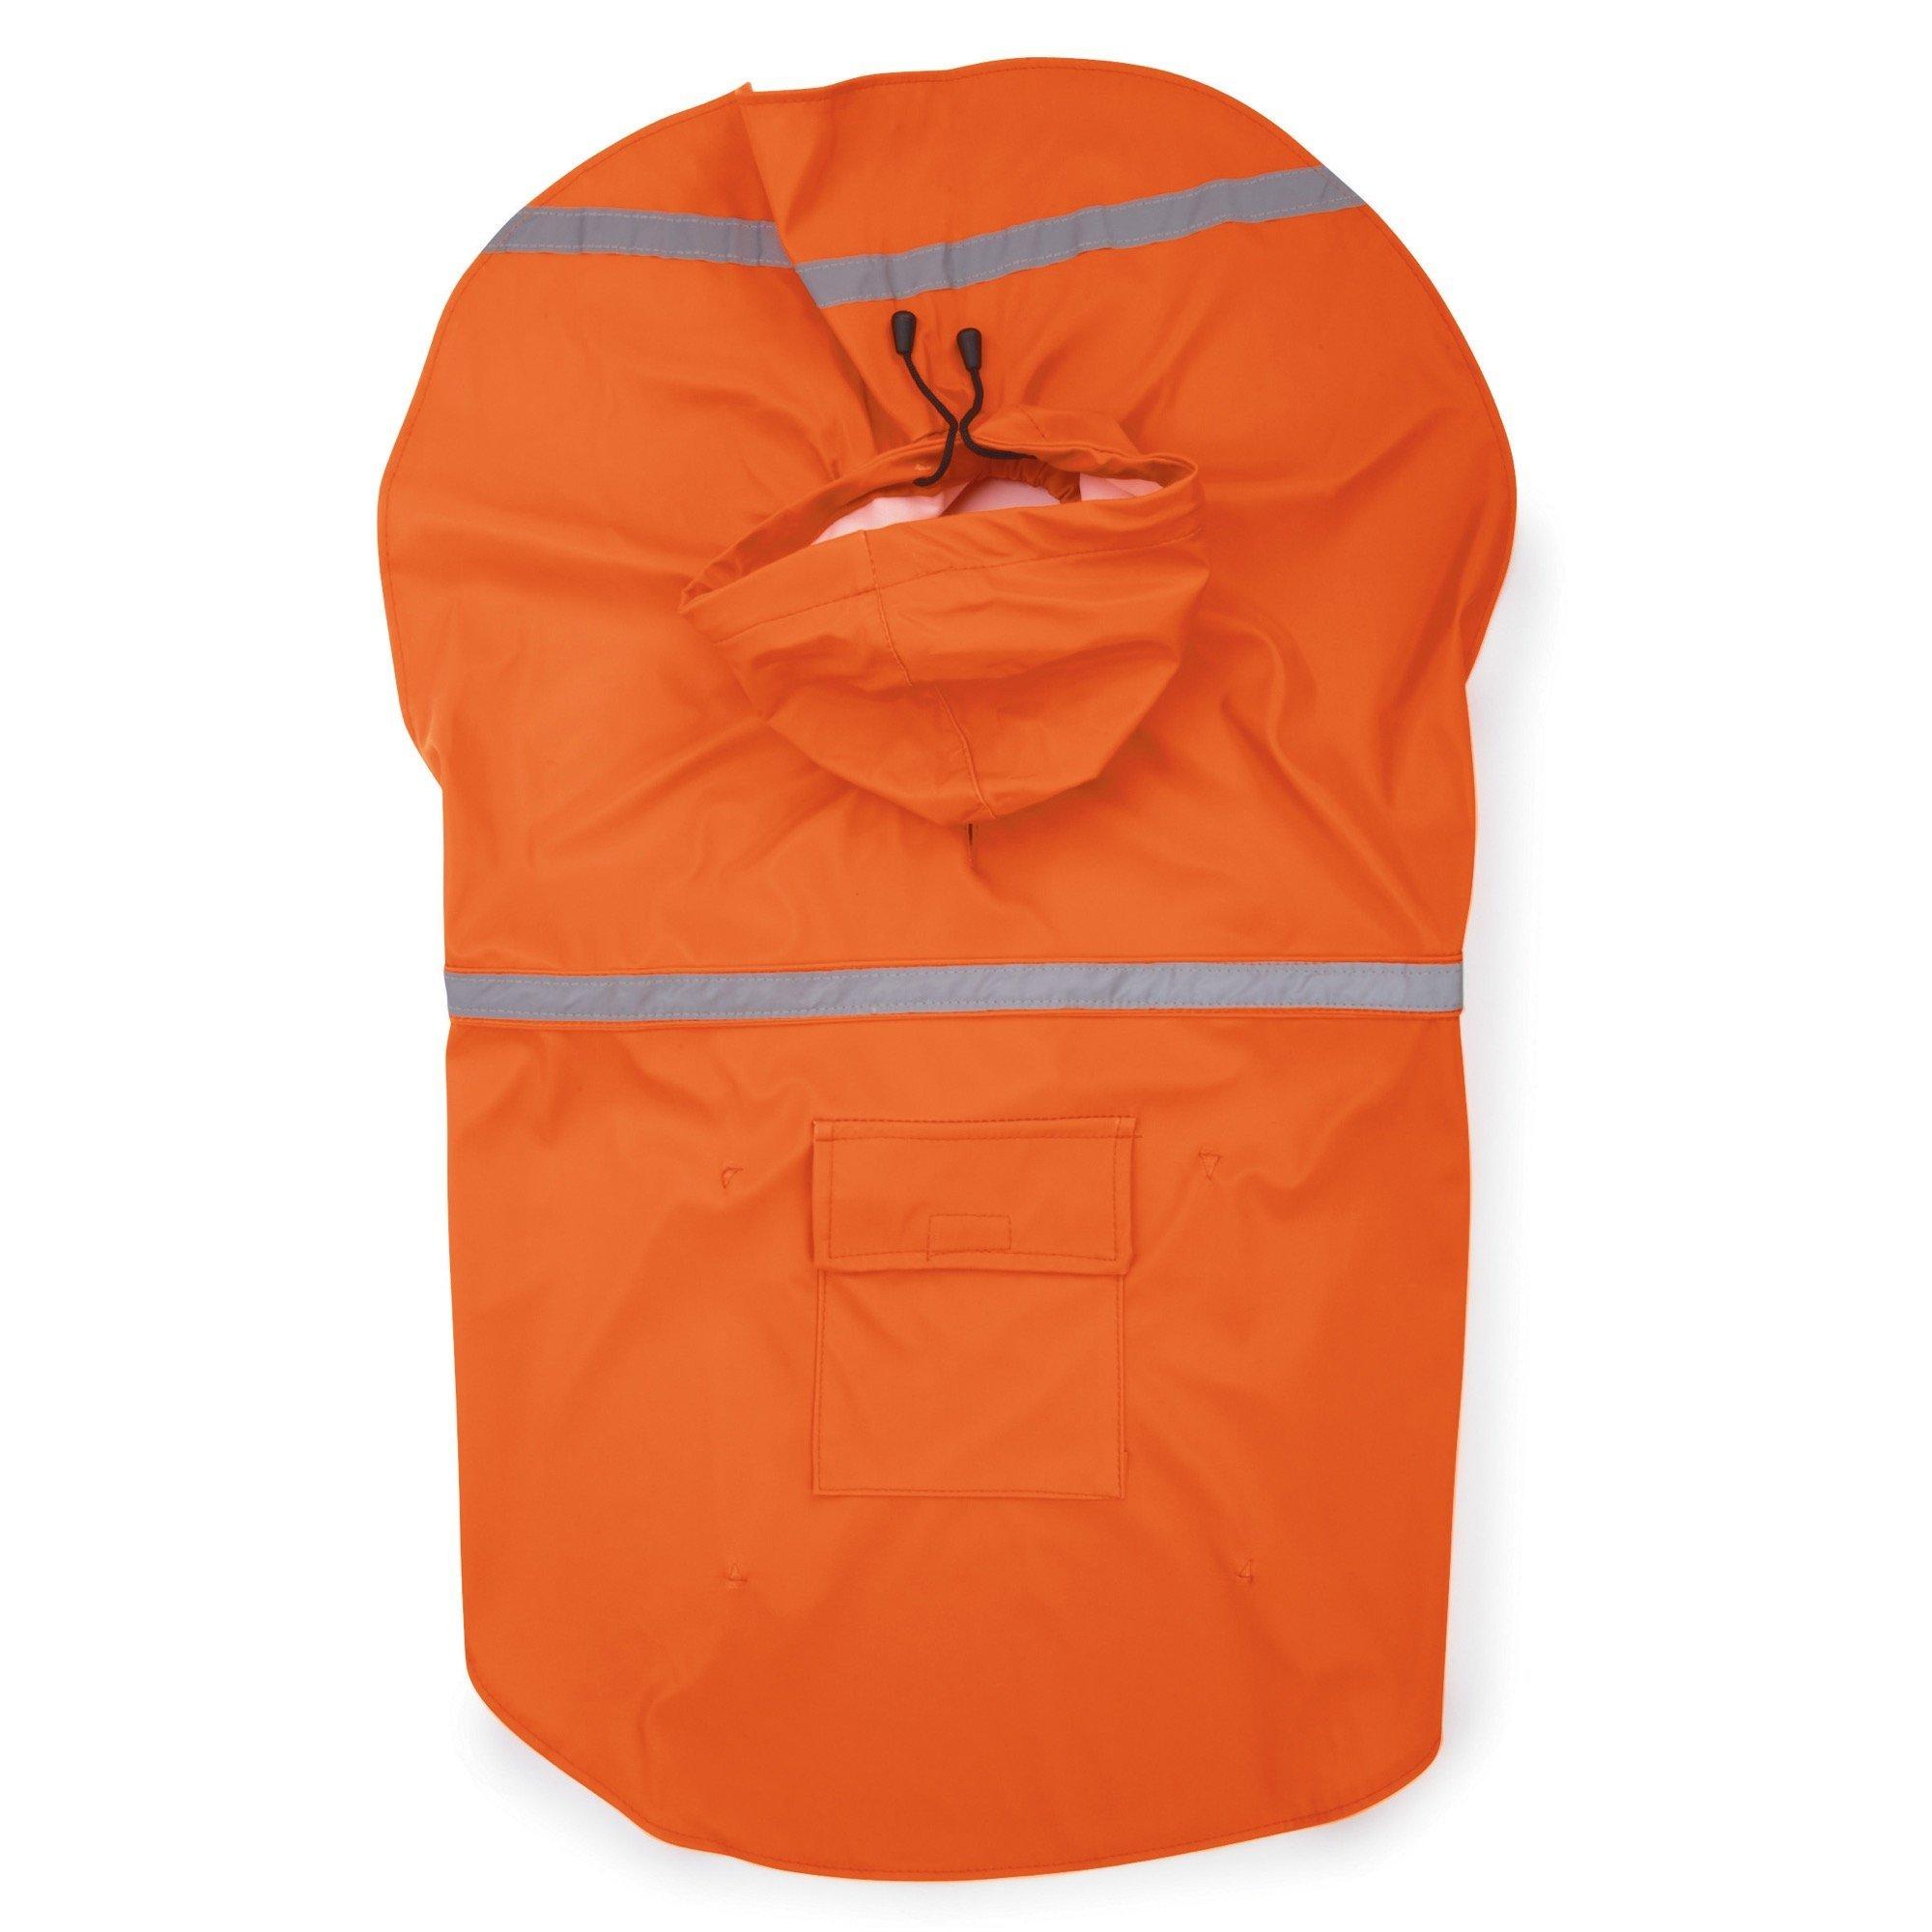 Guardian Gear Dog Raincoat Reflective Rain Jacket for Dogs Orange X-Small